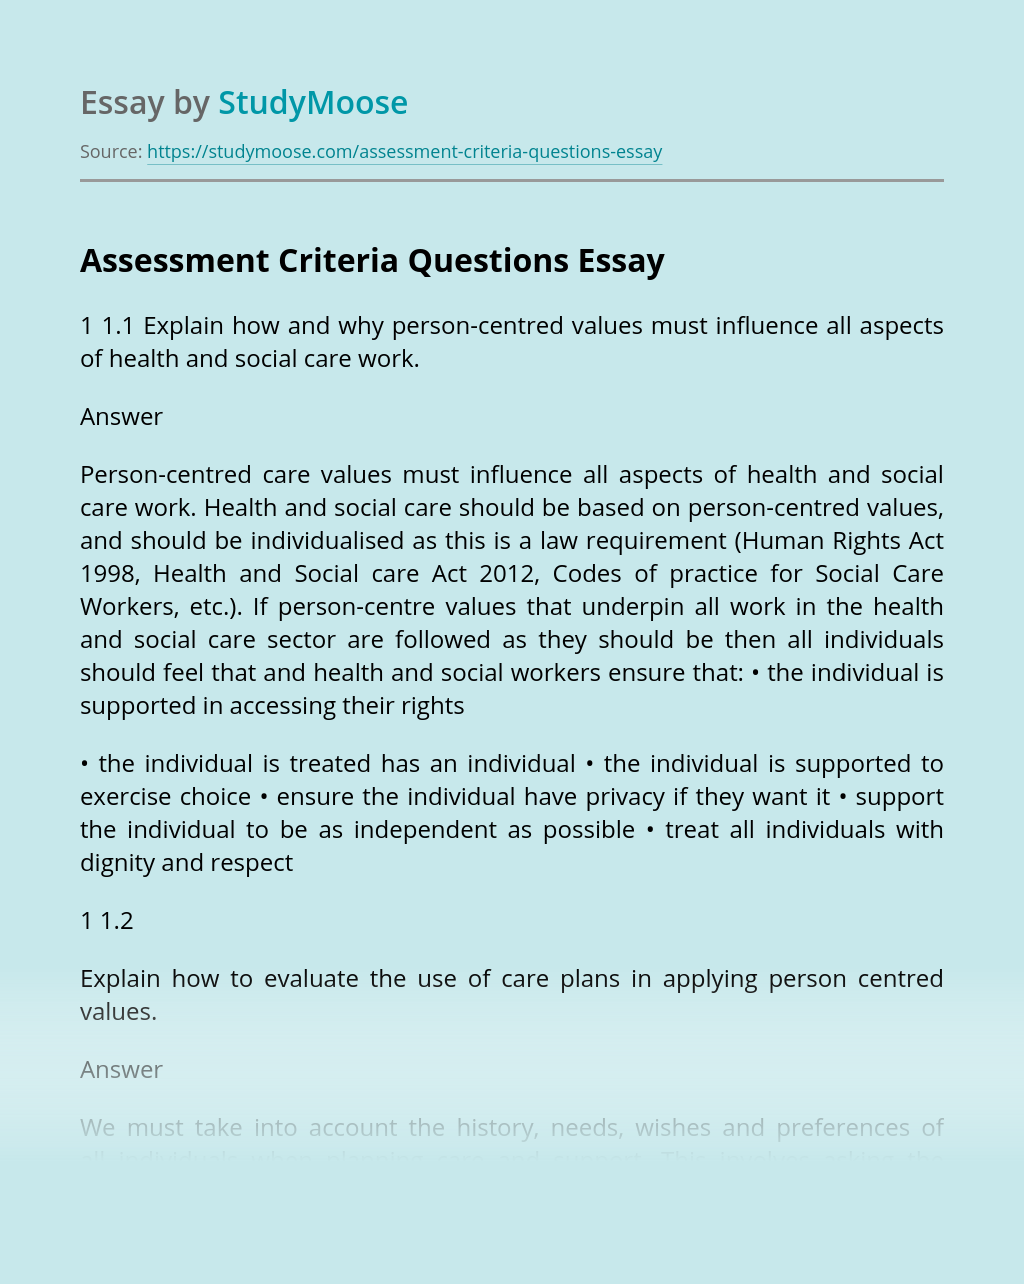 Assessment Criteria Questions